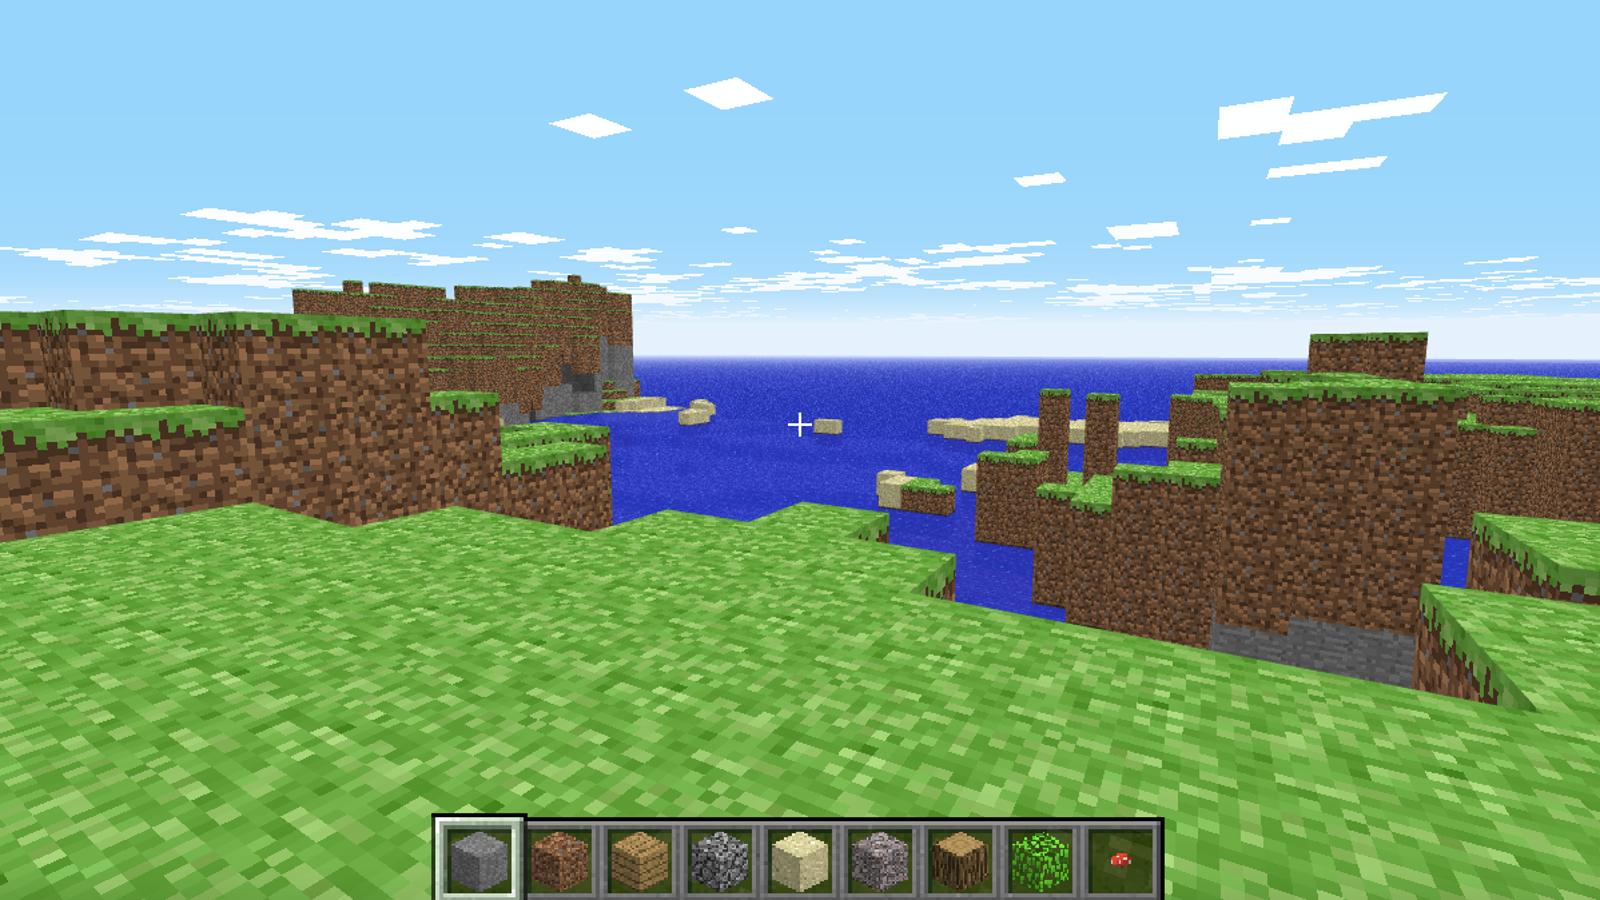 minecraft demo mode free play